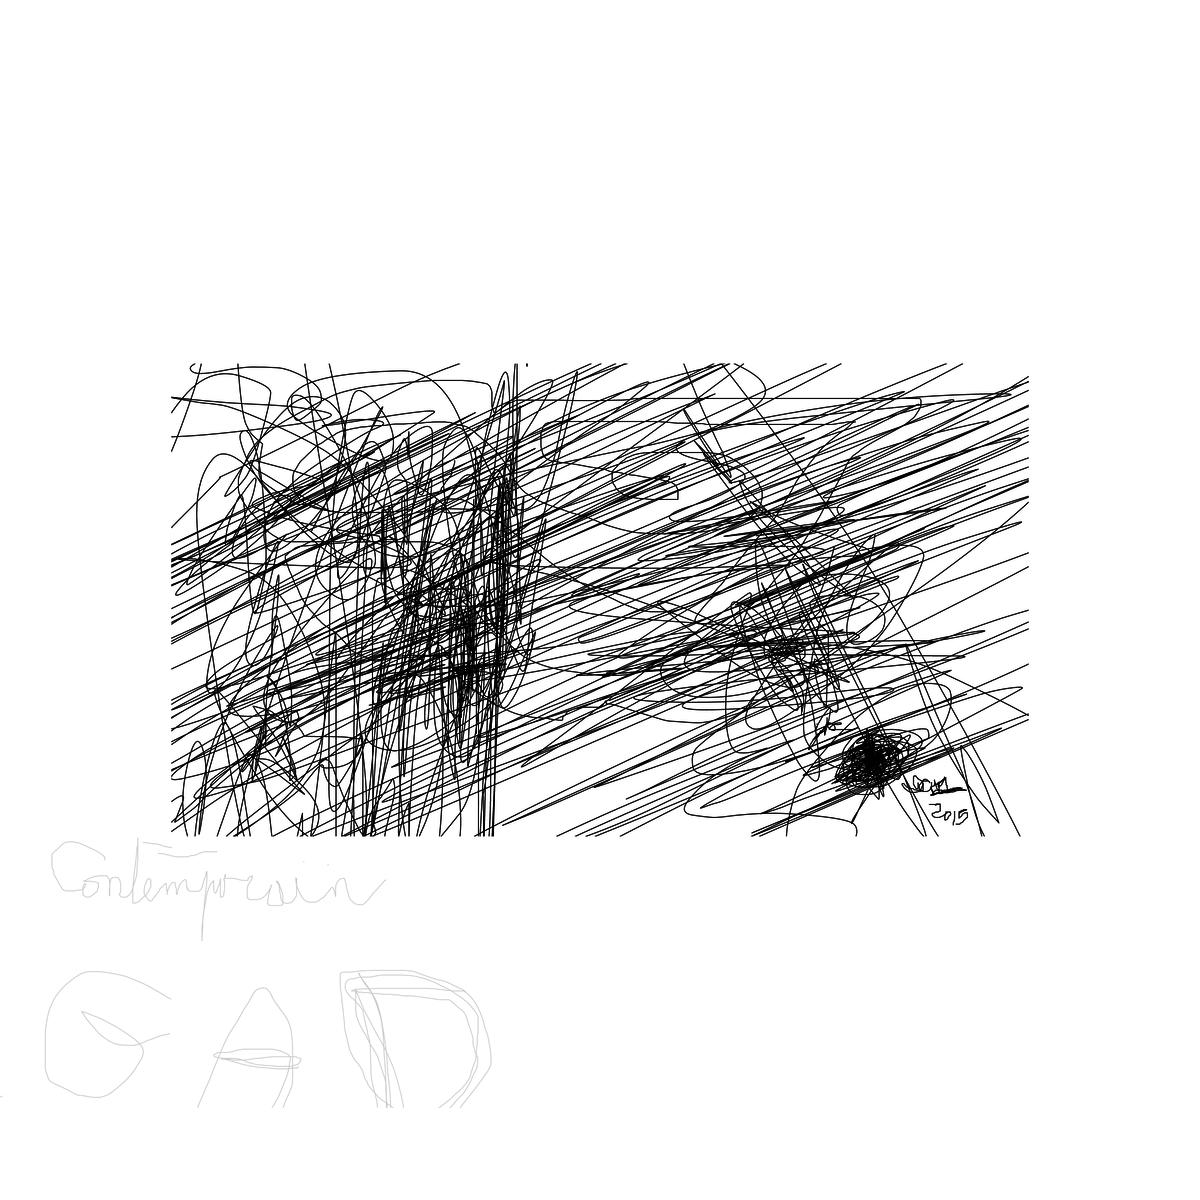 BAAAM drawing#18530 lat:43.3044662475585940lng: 5.3924255371093750